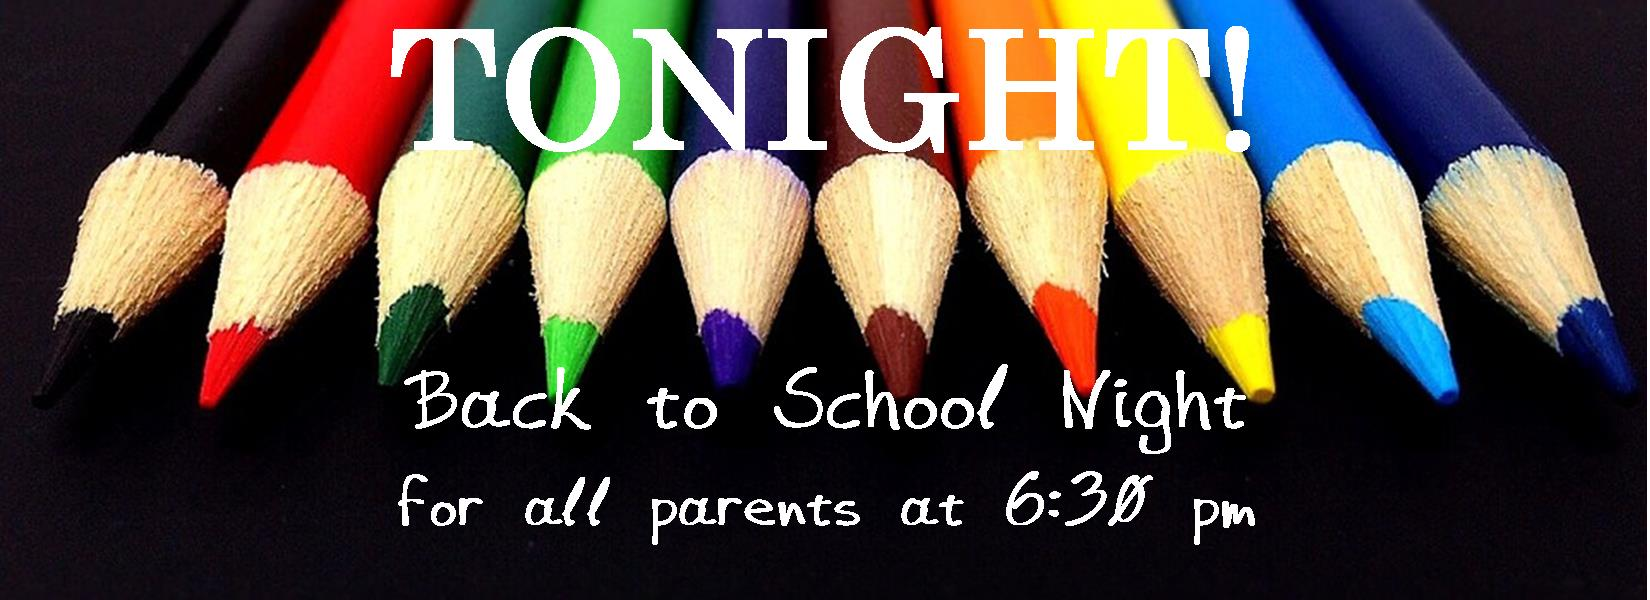 back to school night tonight.jpg